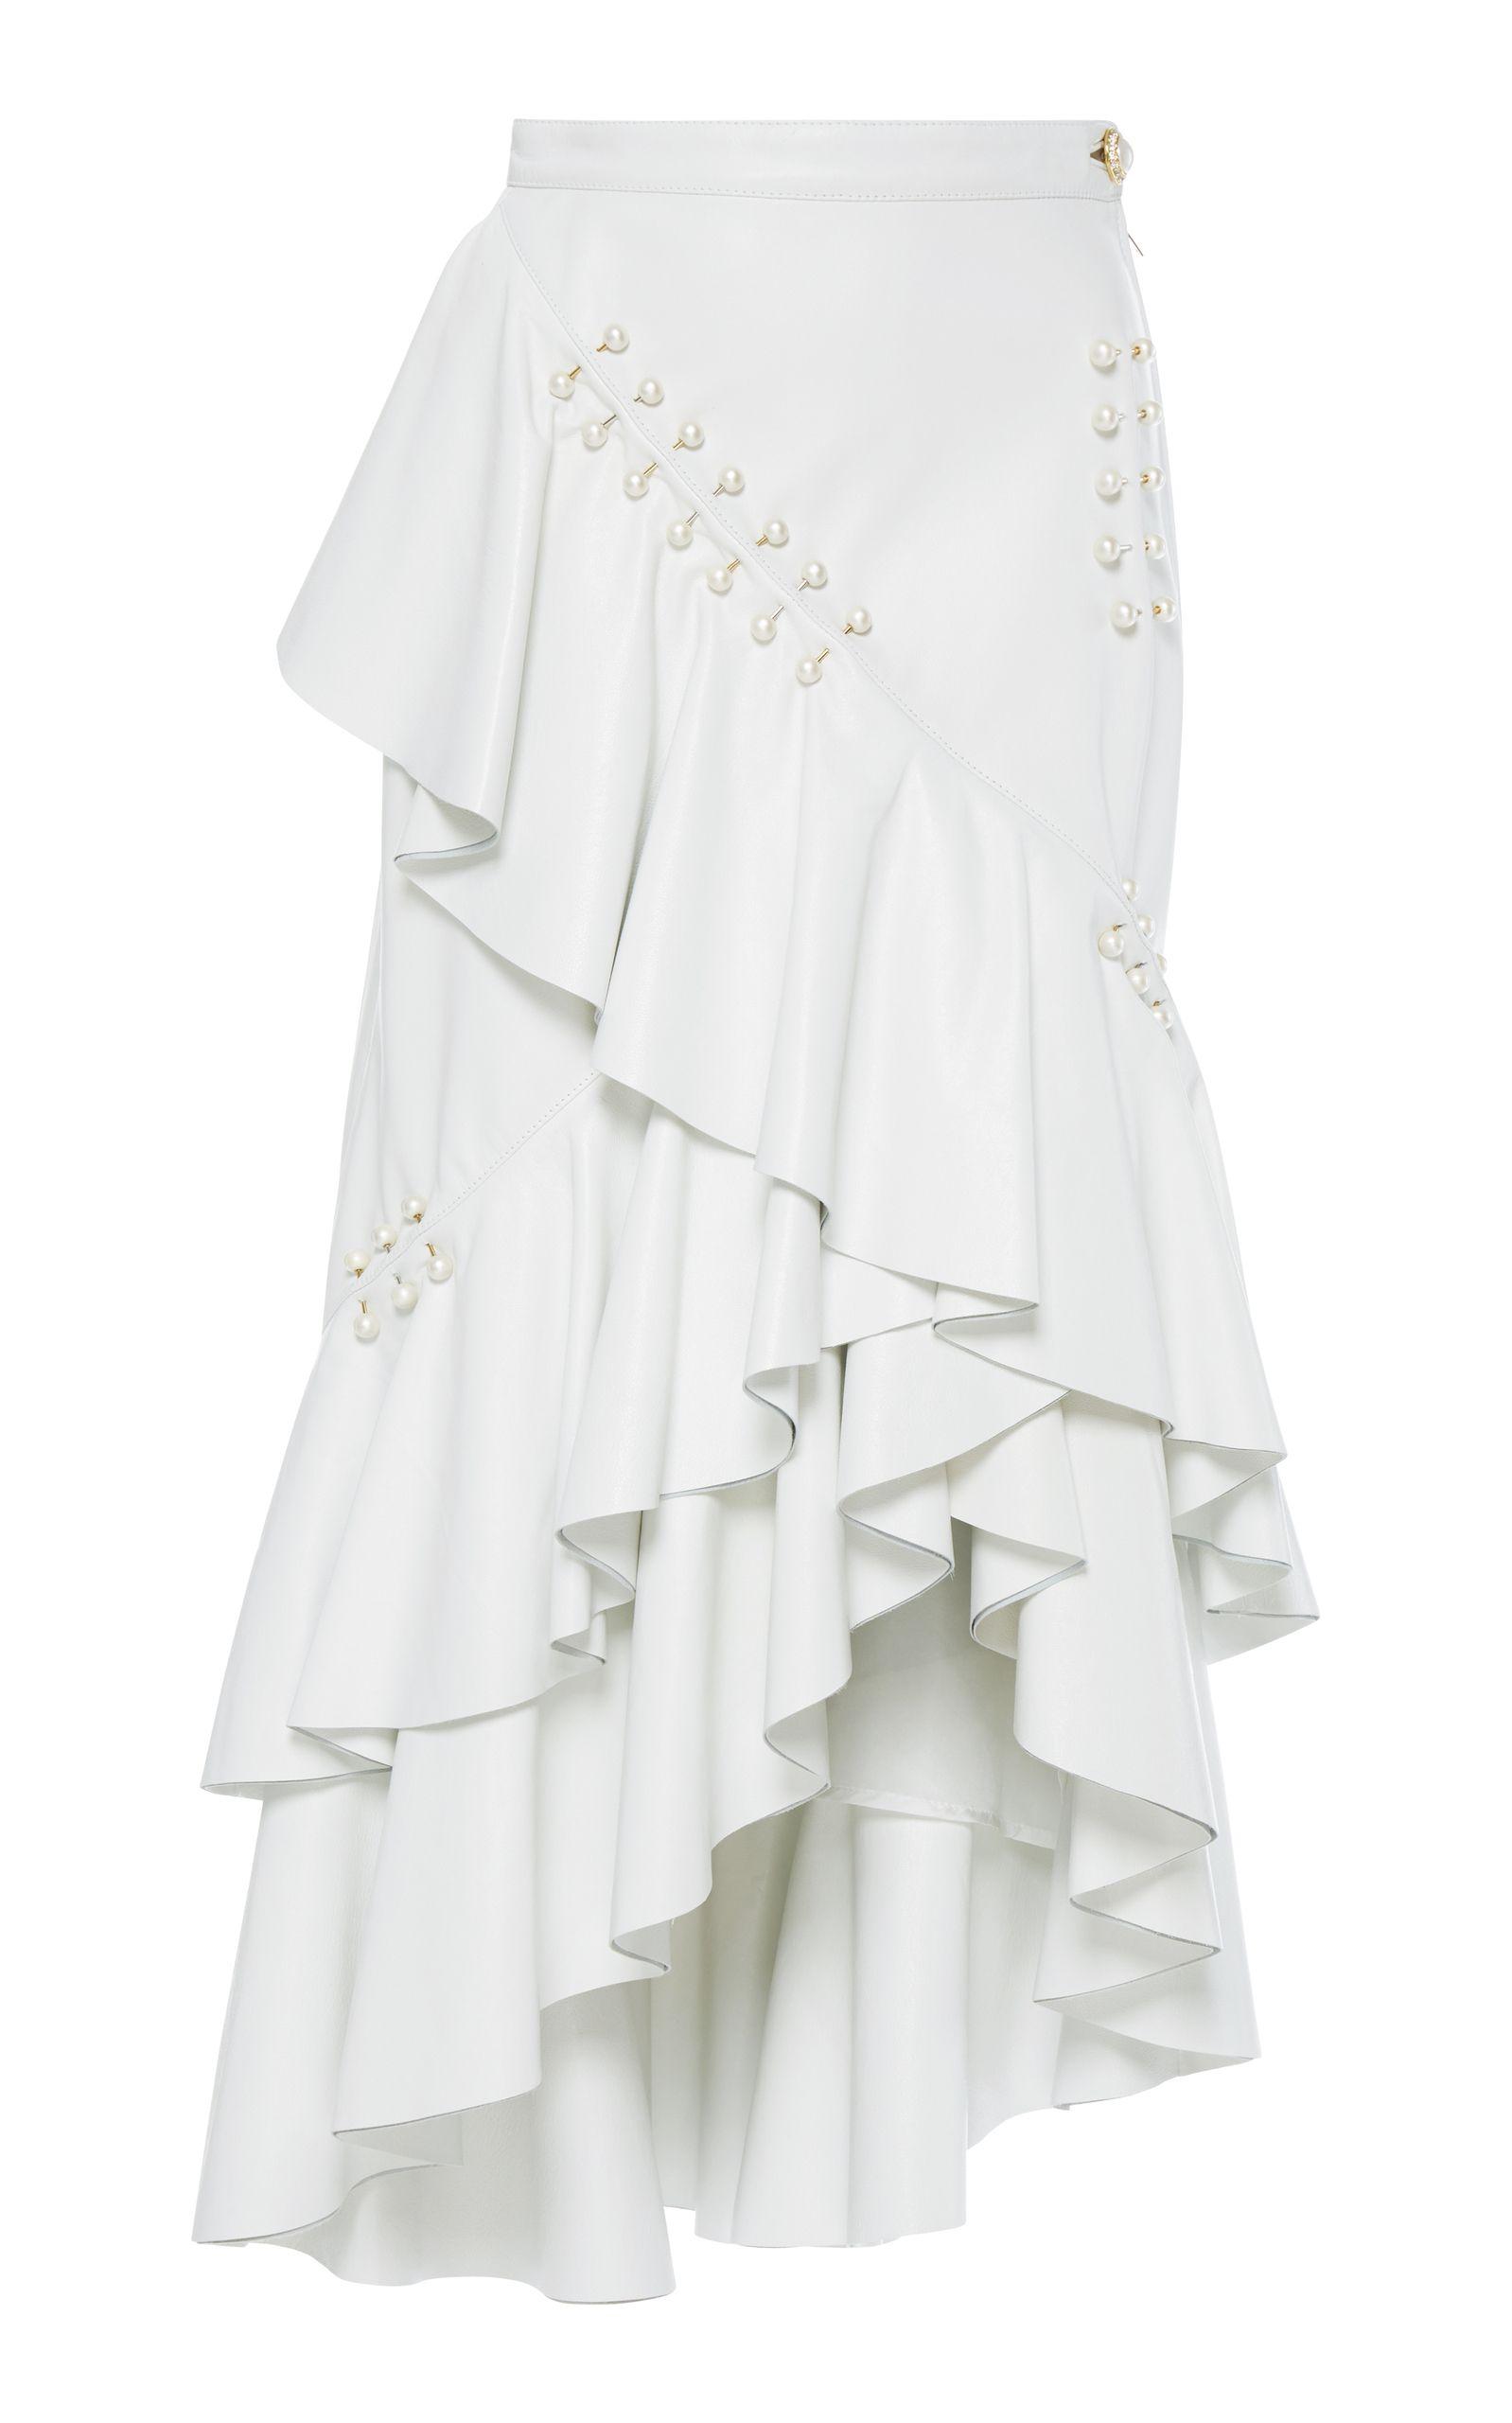 1df36621da Leather Ruffled Skirt | #Whiteout | Ruffle skirt, White leather ...